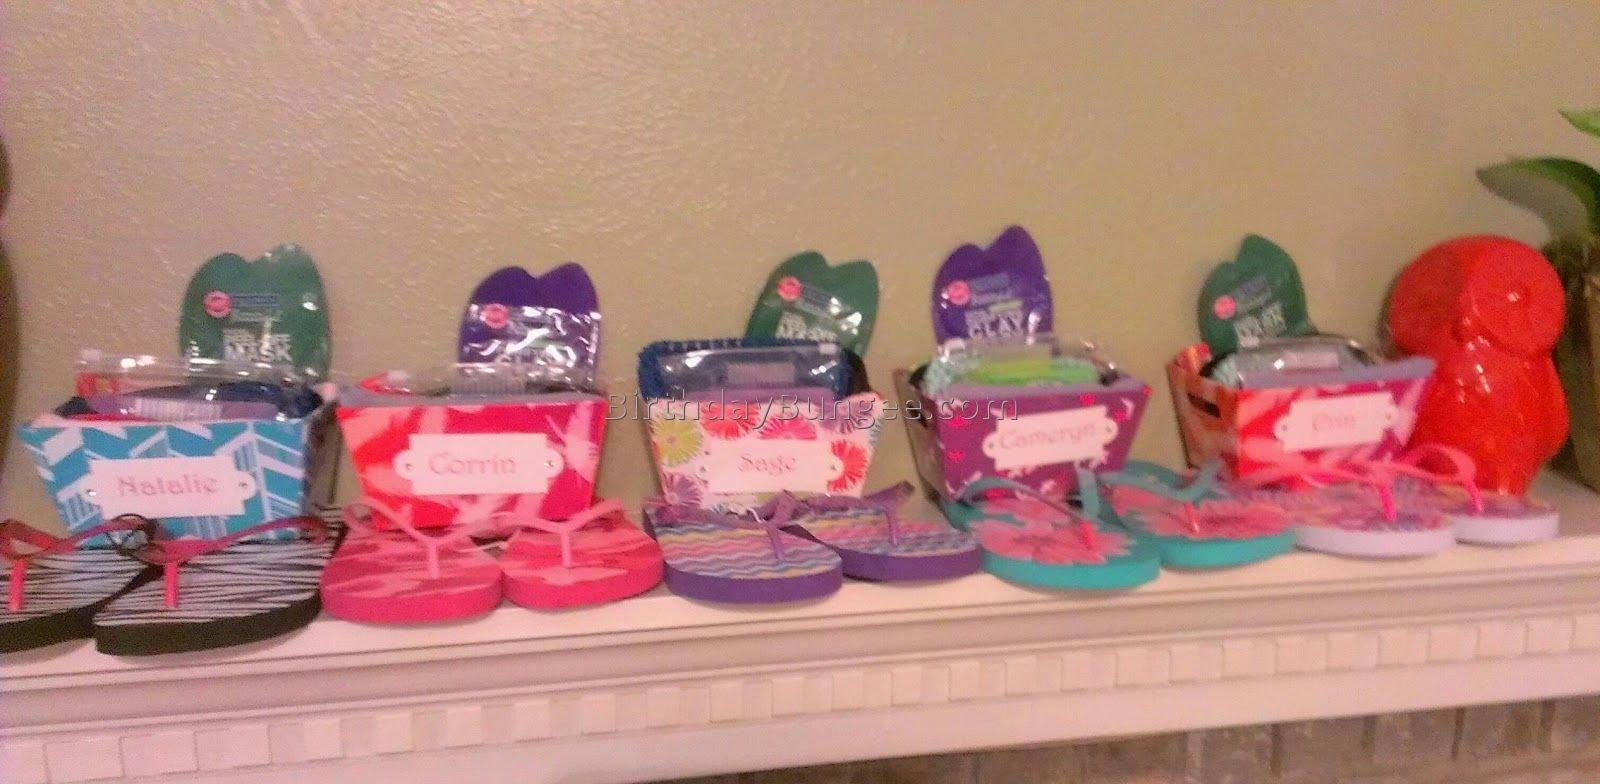 10 Beautiful 4 Year Old Girl Birthday Party Ideas themes birthday 5 year old little girl birthday party ideas plus 4 2 2020